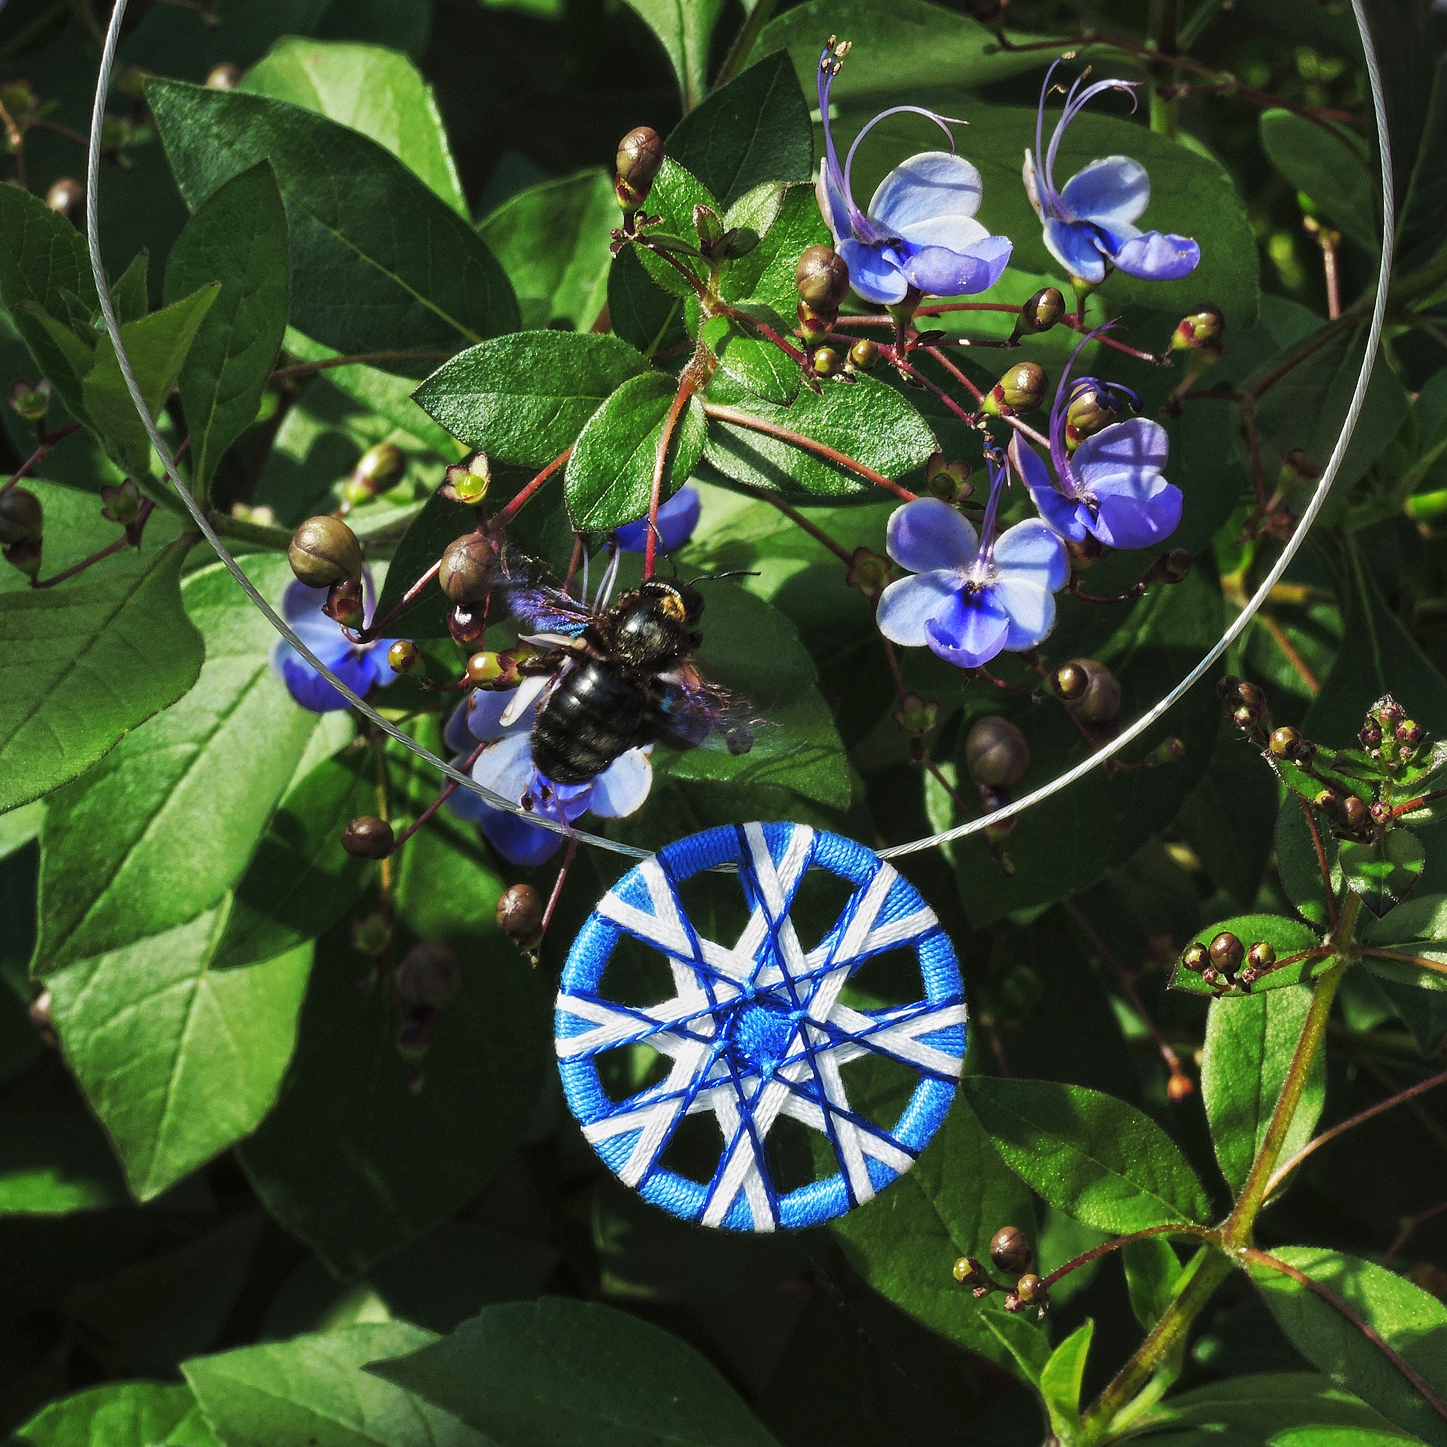 Nr. 49  Zwirnknopf-Anhänger | Ø 44 mm | Material: Aluminium, Baumwolle